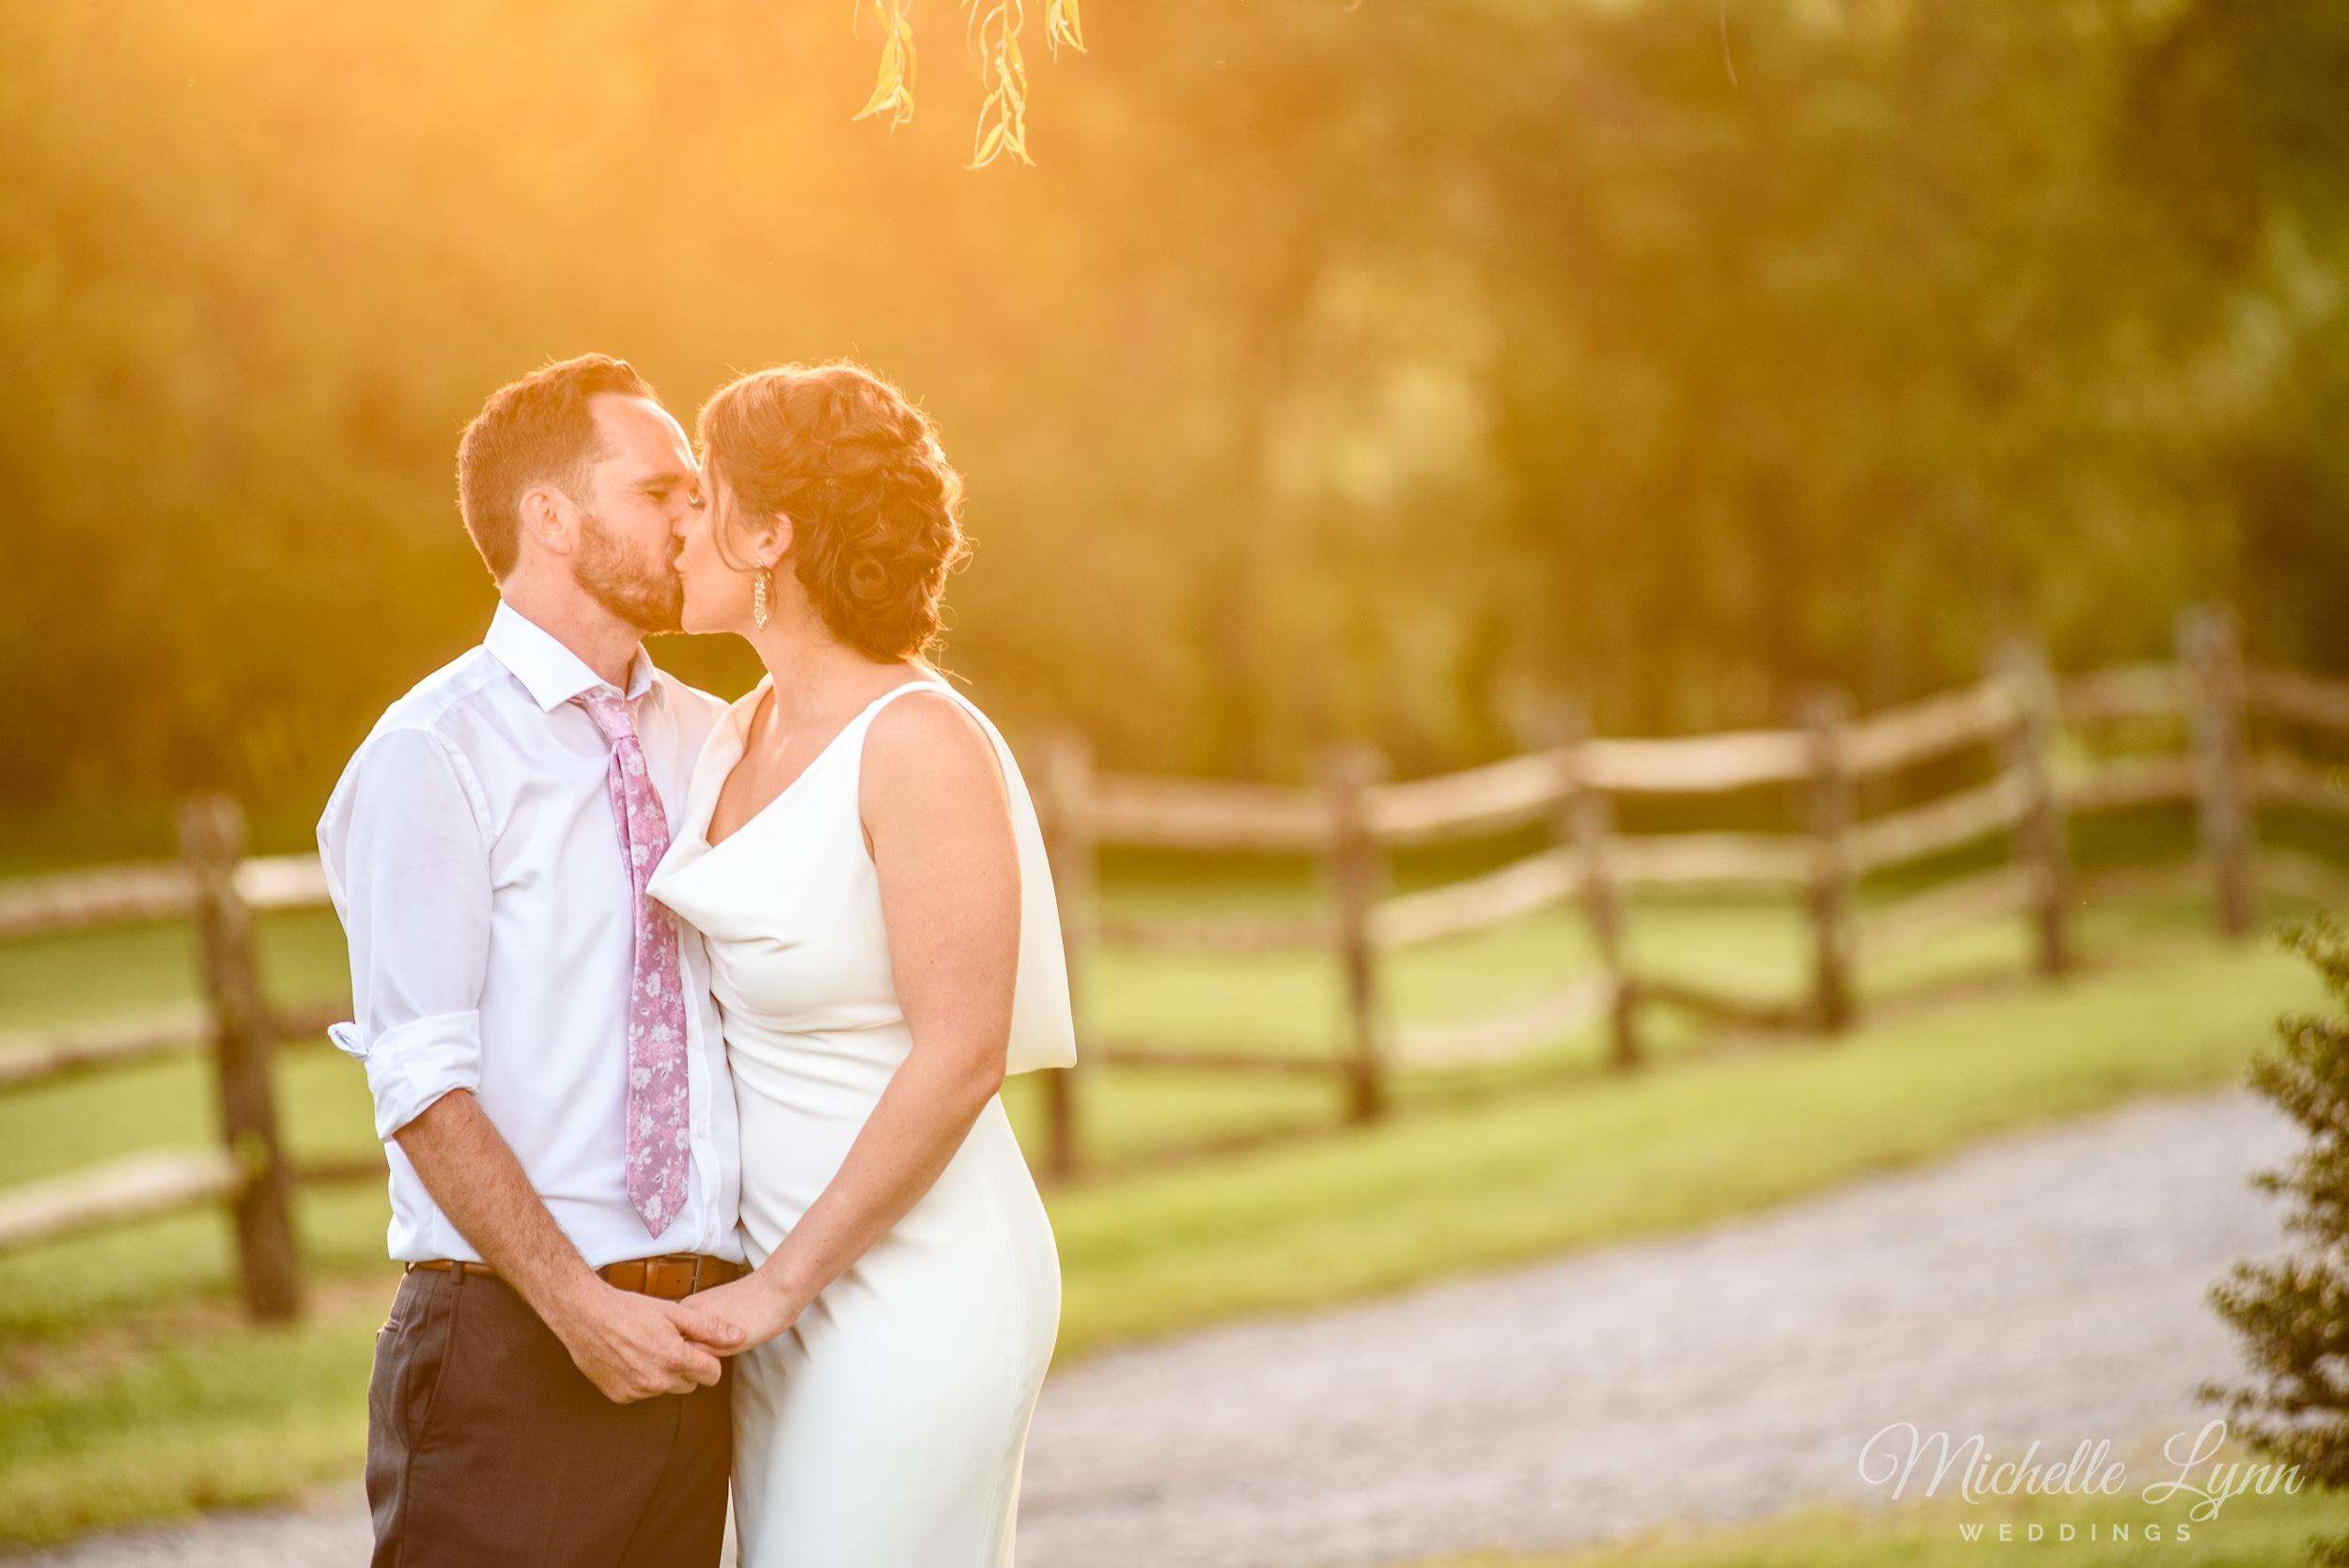 mlw-unionville-vineyards-nj-wedding-photography-90.jpg